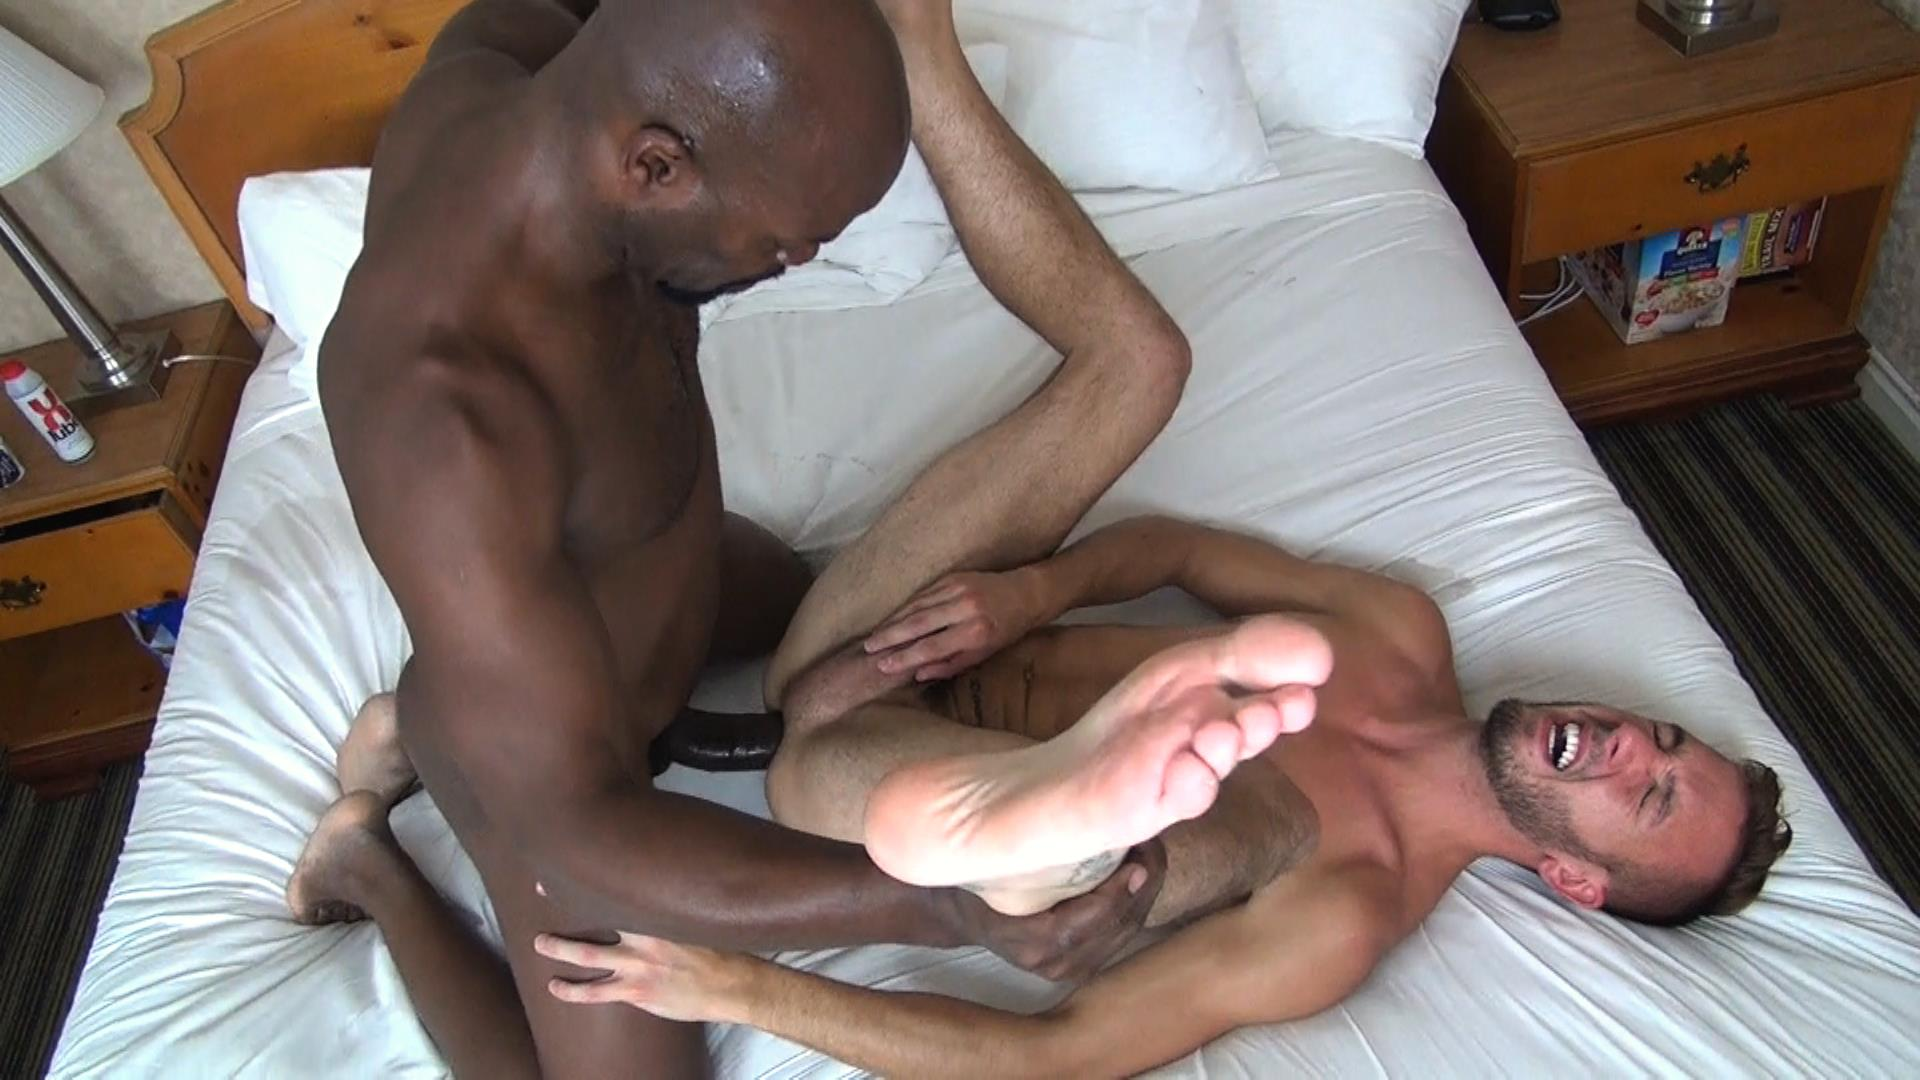 Nudist asian masturbate cock and interracial